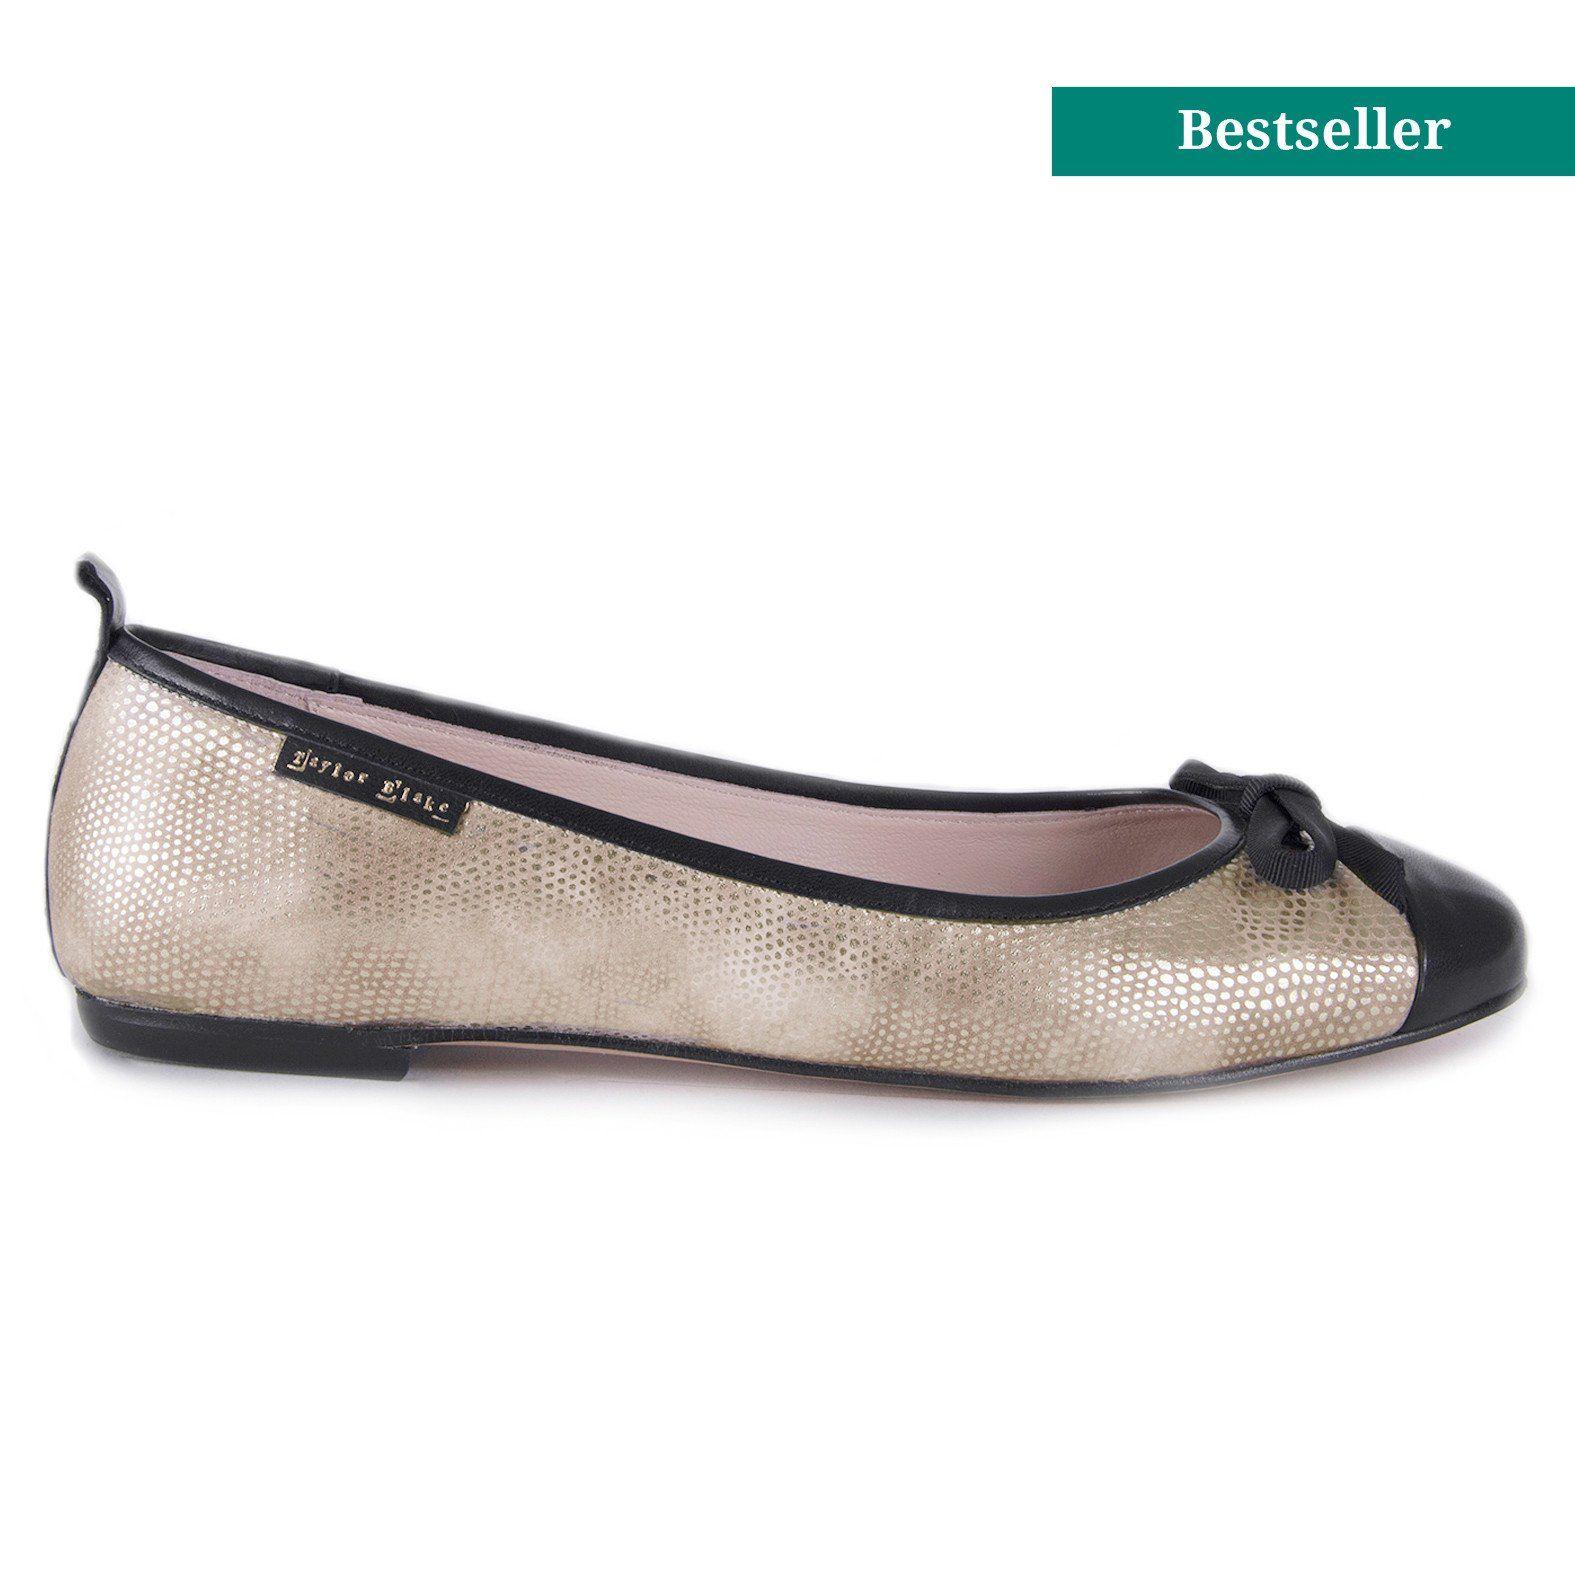 BESTSELLER | Gold Lora | Women's Gold Metallic Leather